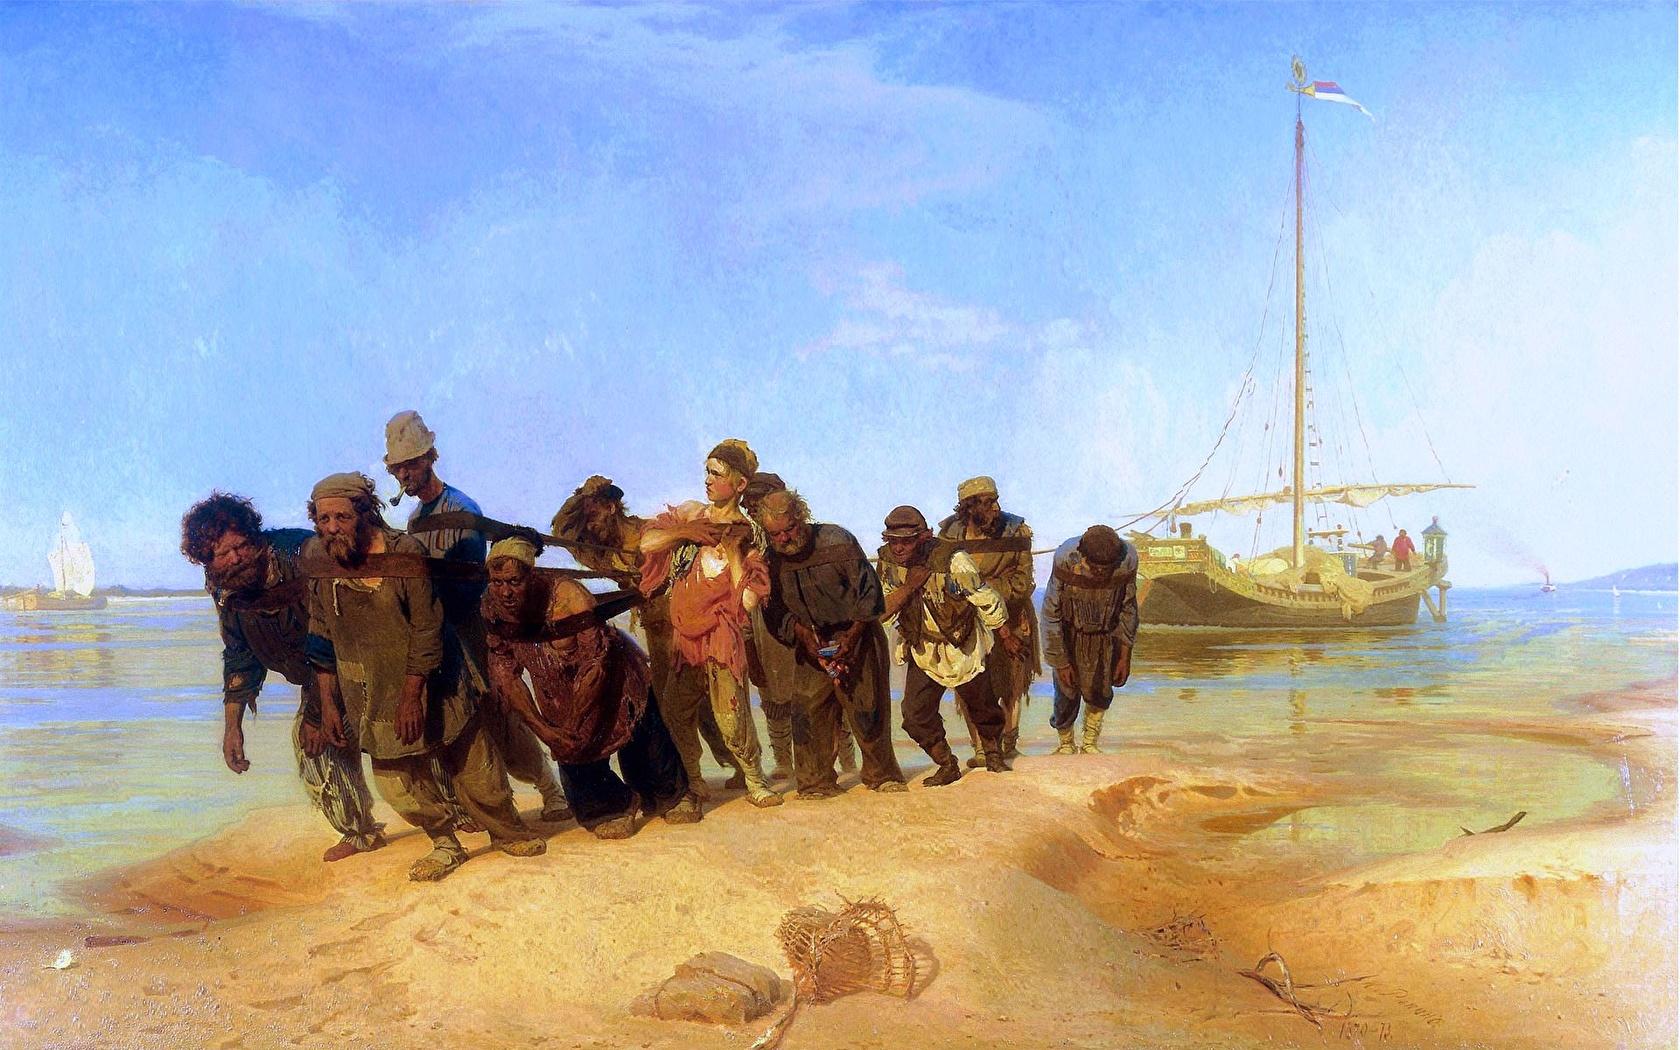 İlya Repin, Volga Nehri'ndeki köleler, 1870-1873